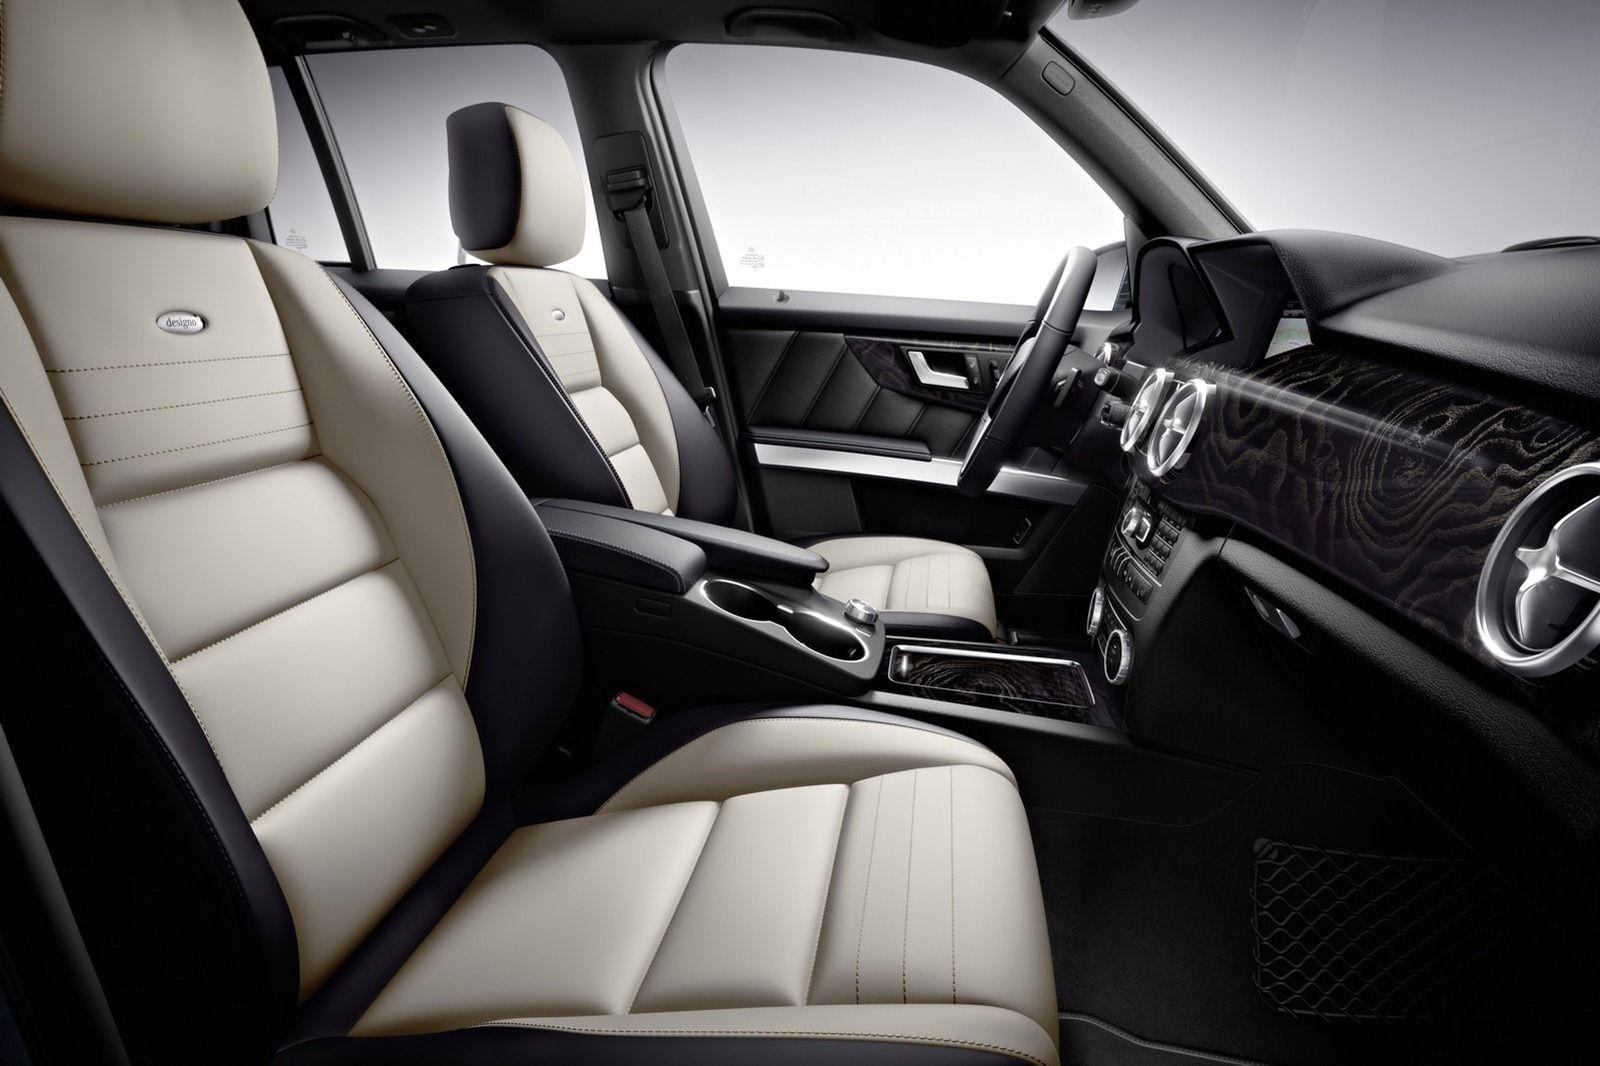 mercedes glk interior - Bing Images | Cars | Pinterest